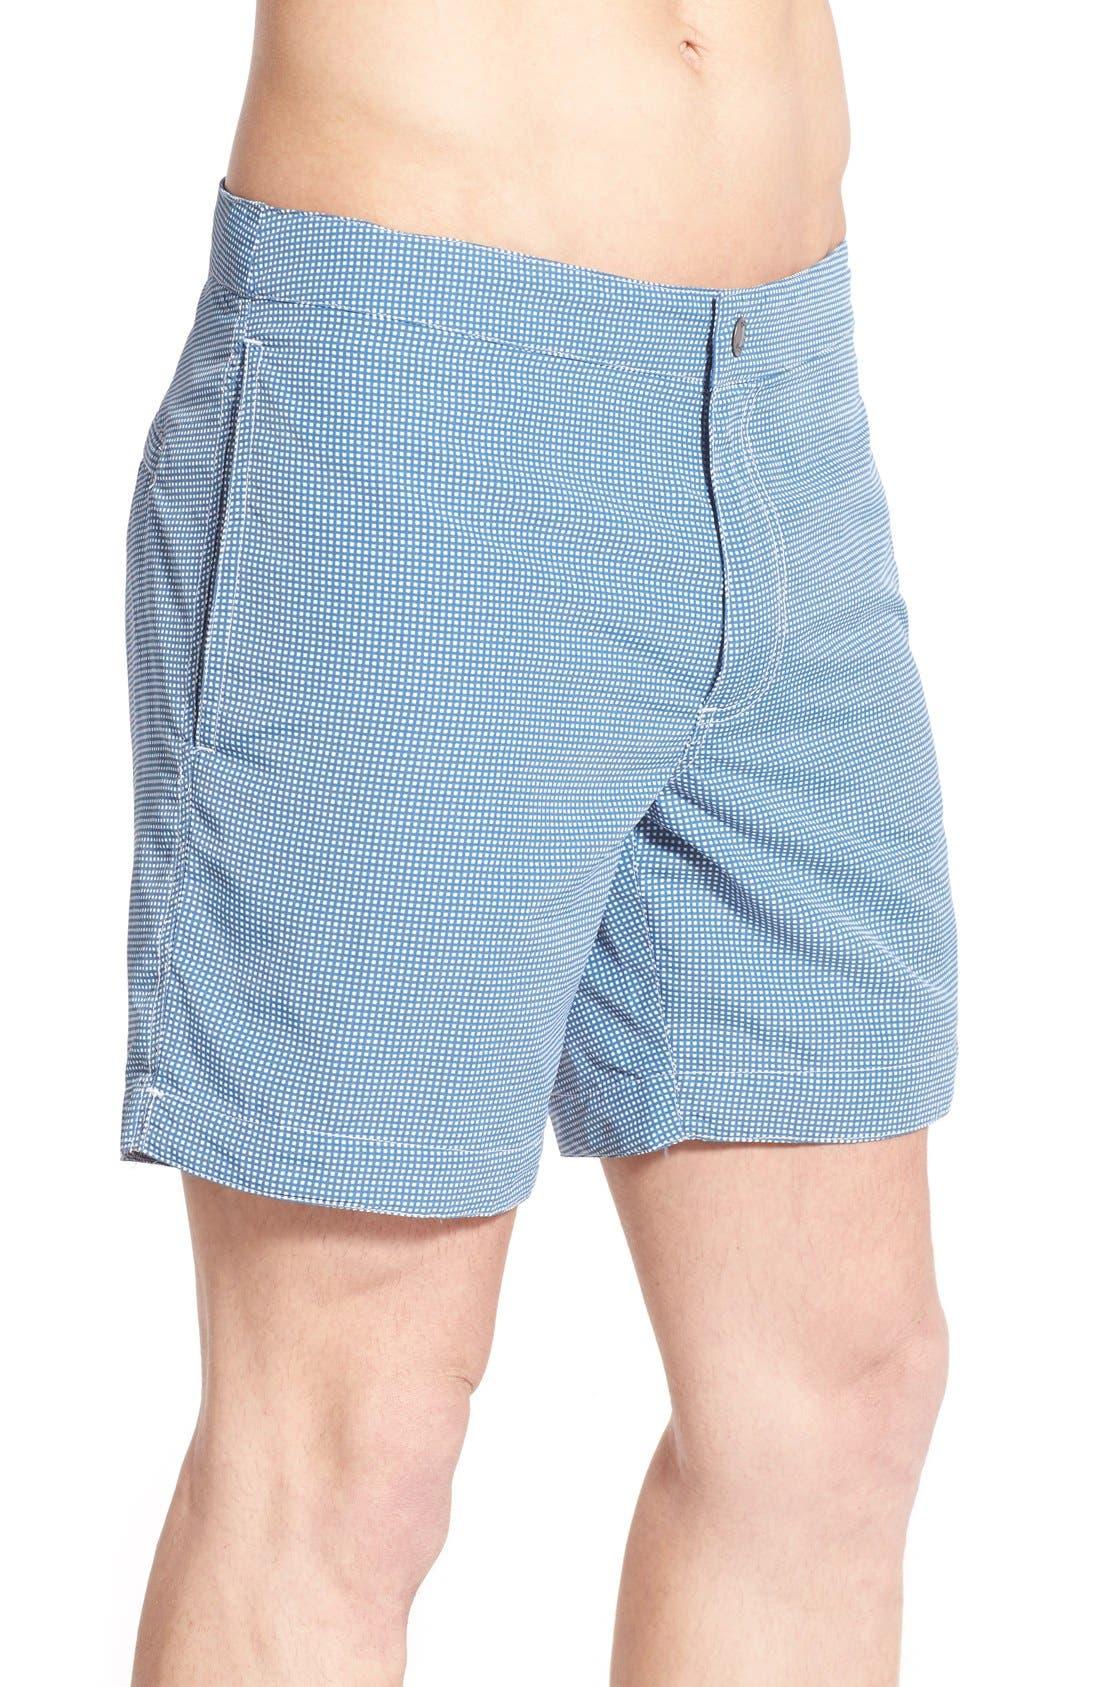 Aruba Tailored Fit Microcheck Swim Trunks,                             Alternate thumbnail 3, color,                             410